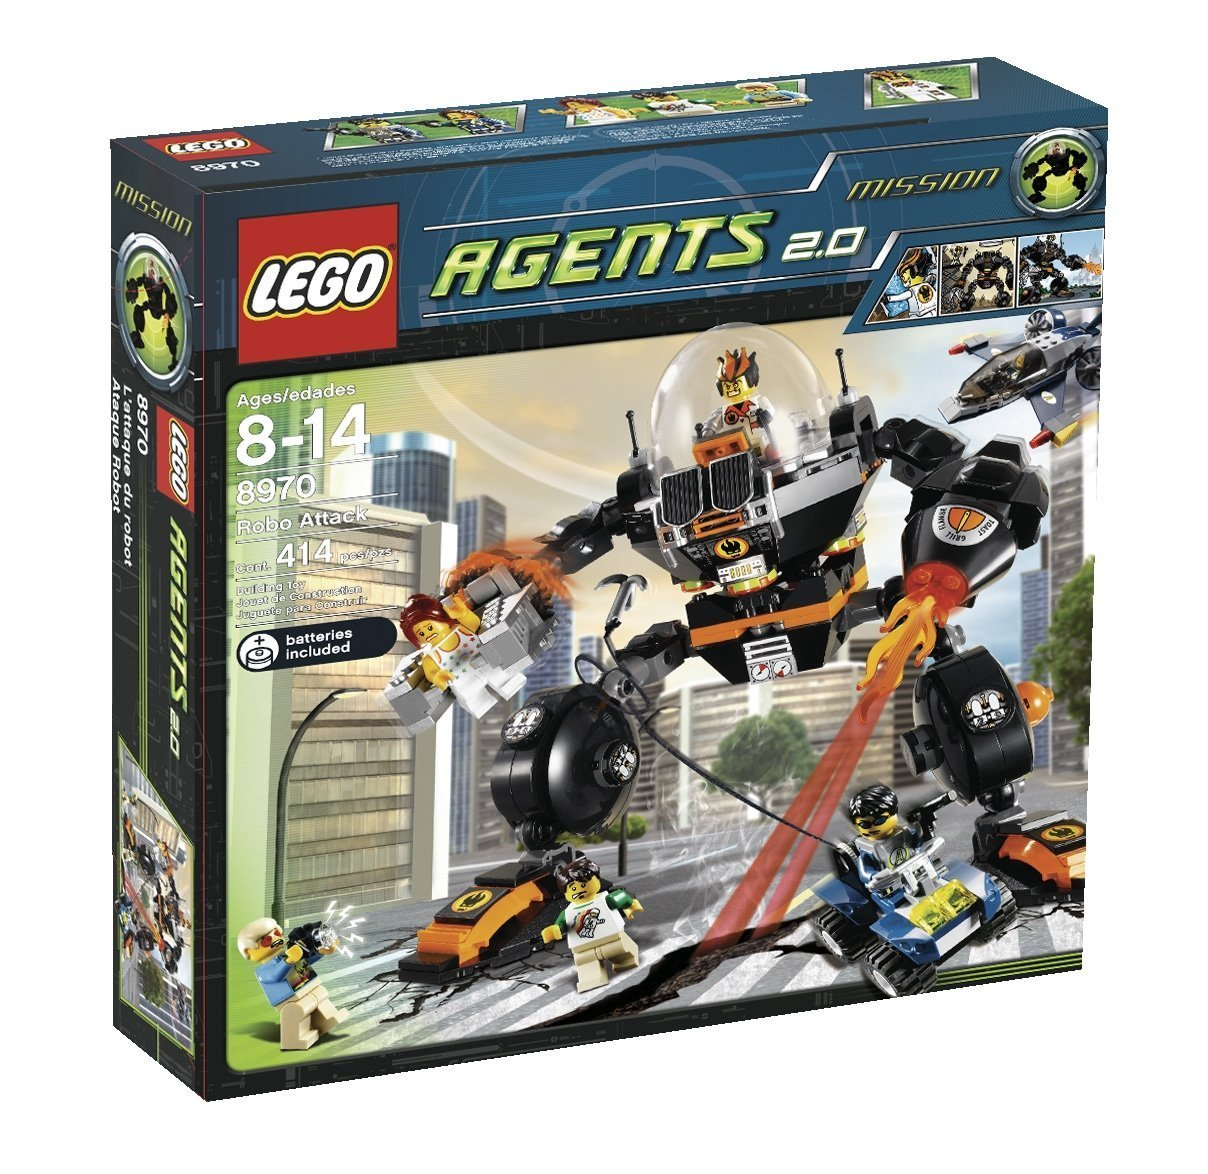 LEGO Agents 8970 - Roboterangriff